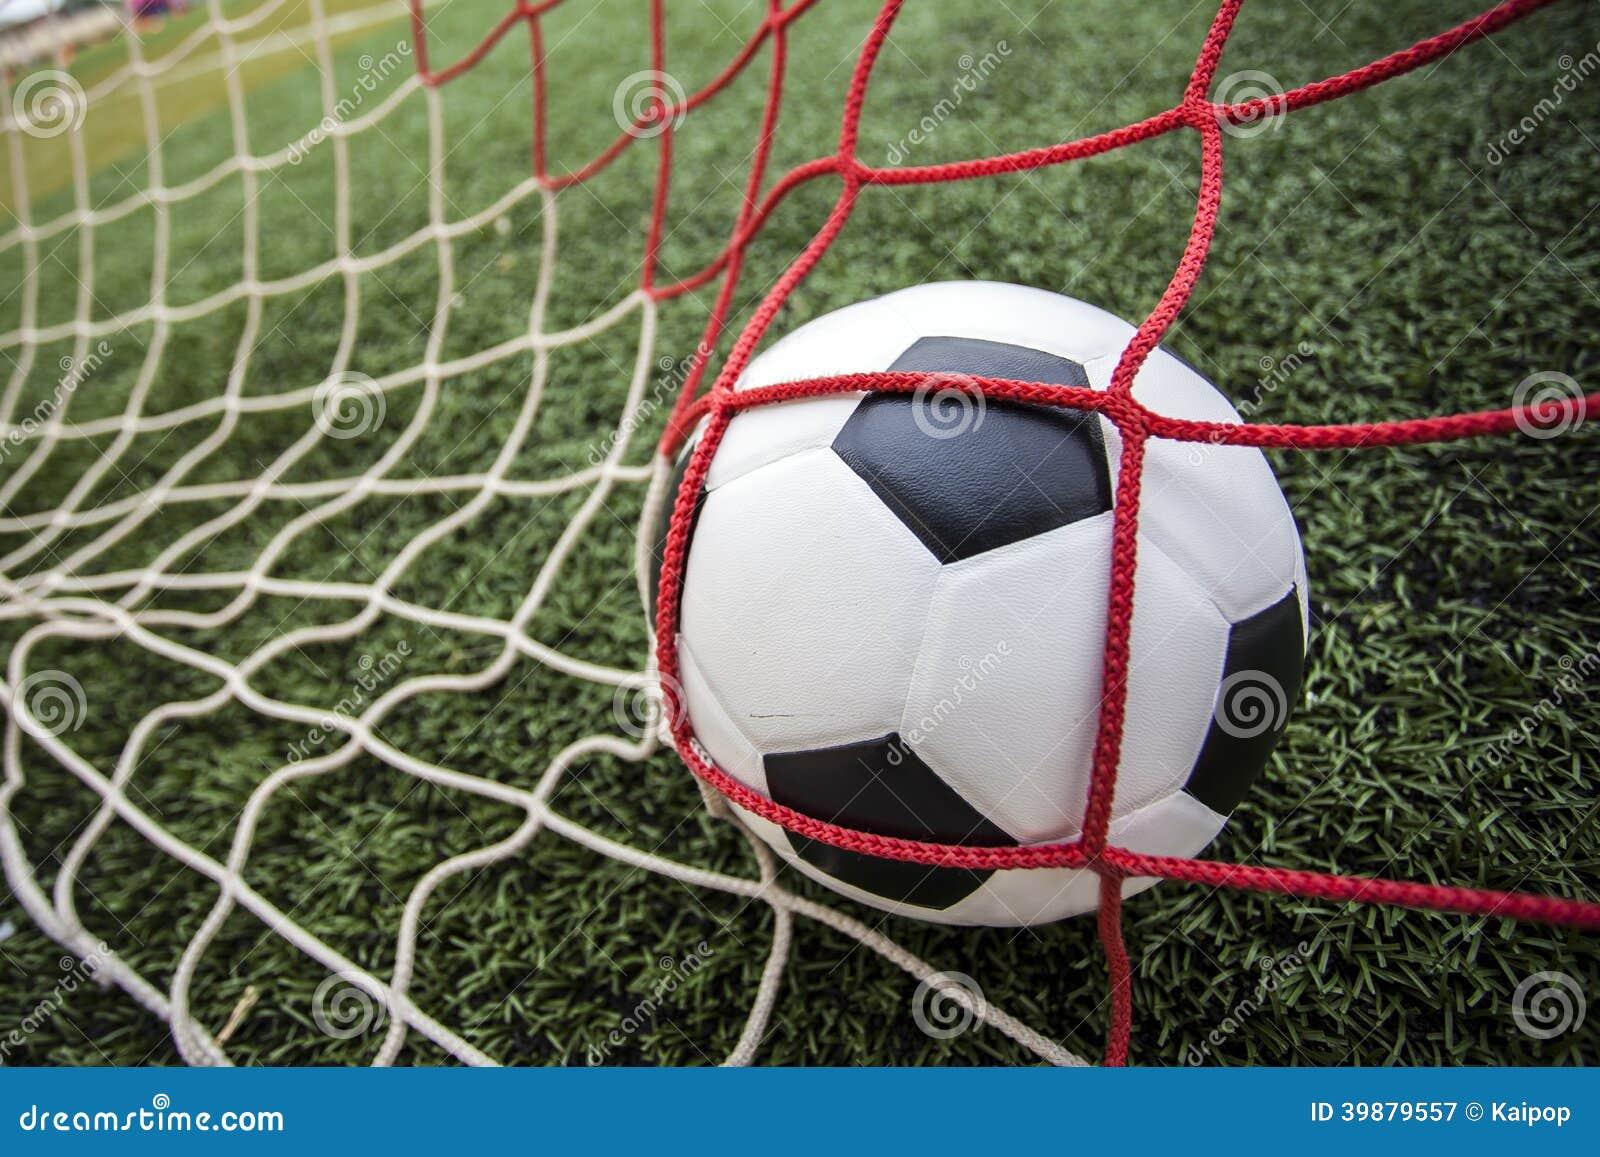 Amazing Soccer football Goal.